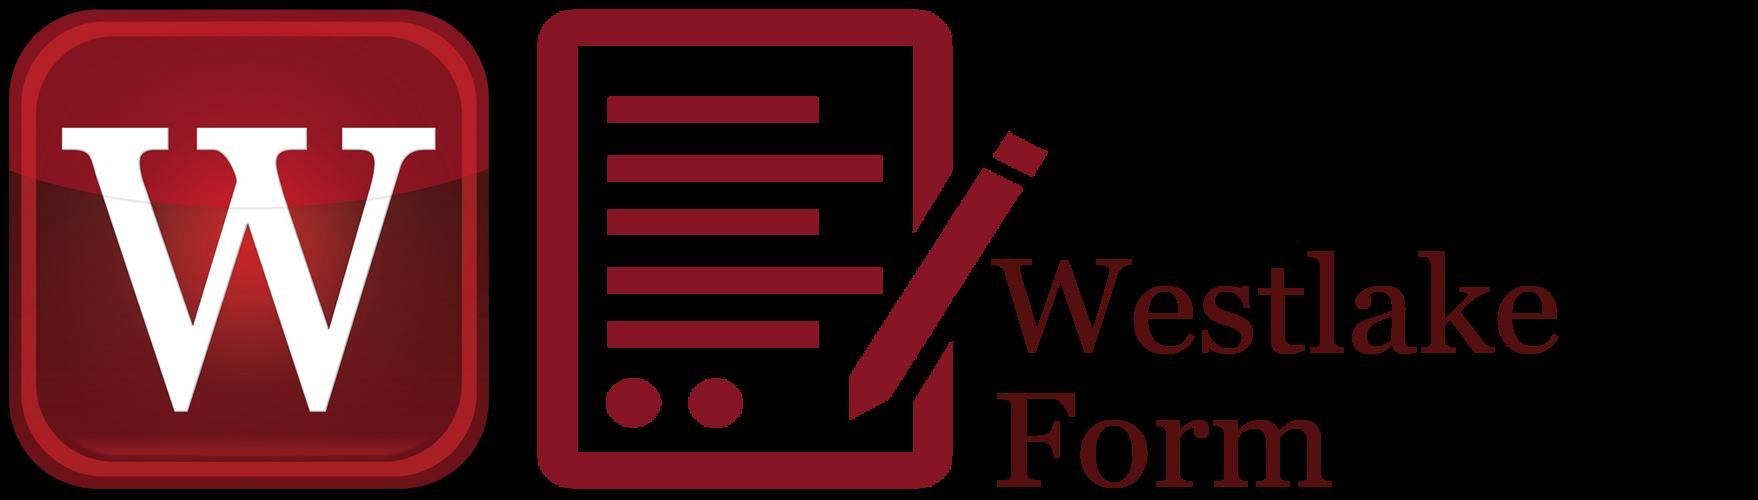 Wfs non funded title request form dealercenter support non funded titlelien release request altavistaventures Images